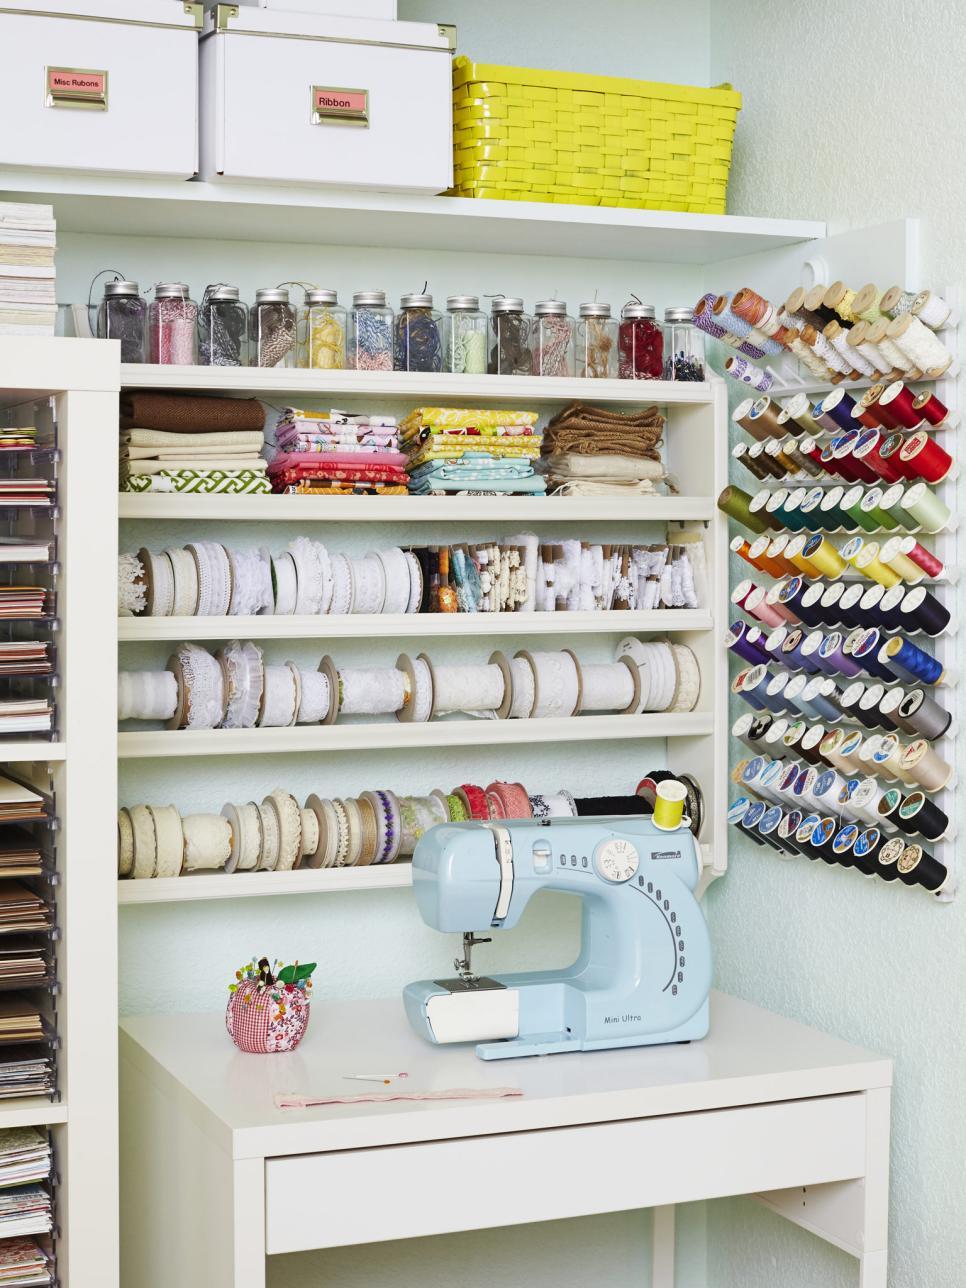 12 creative craft or sewing room storage solutions diy. Black Bedroom Furniture Sets. Home Design Ideas